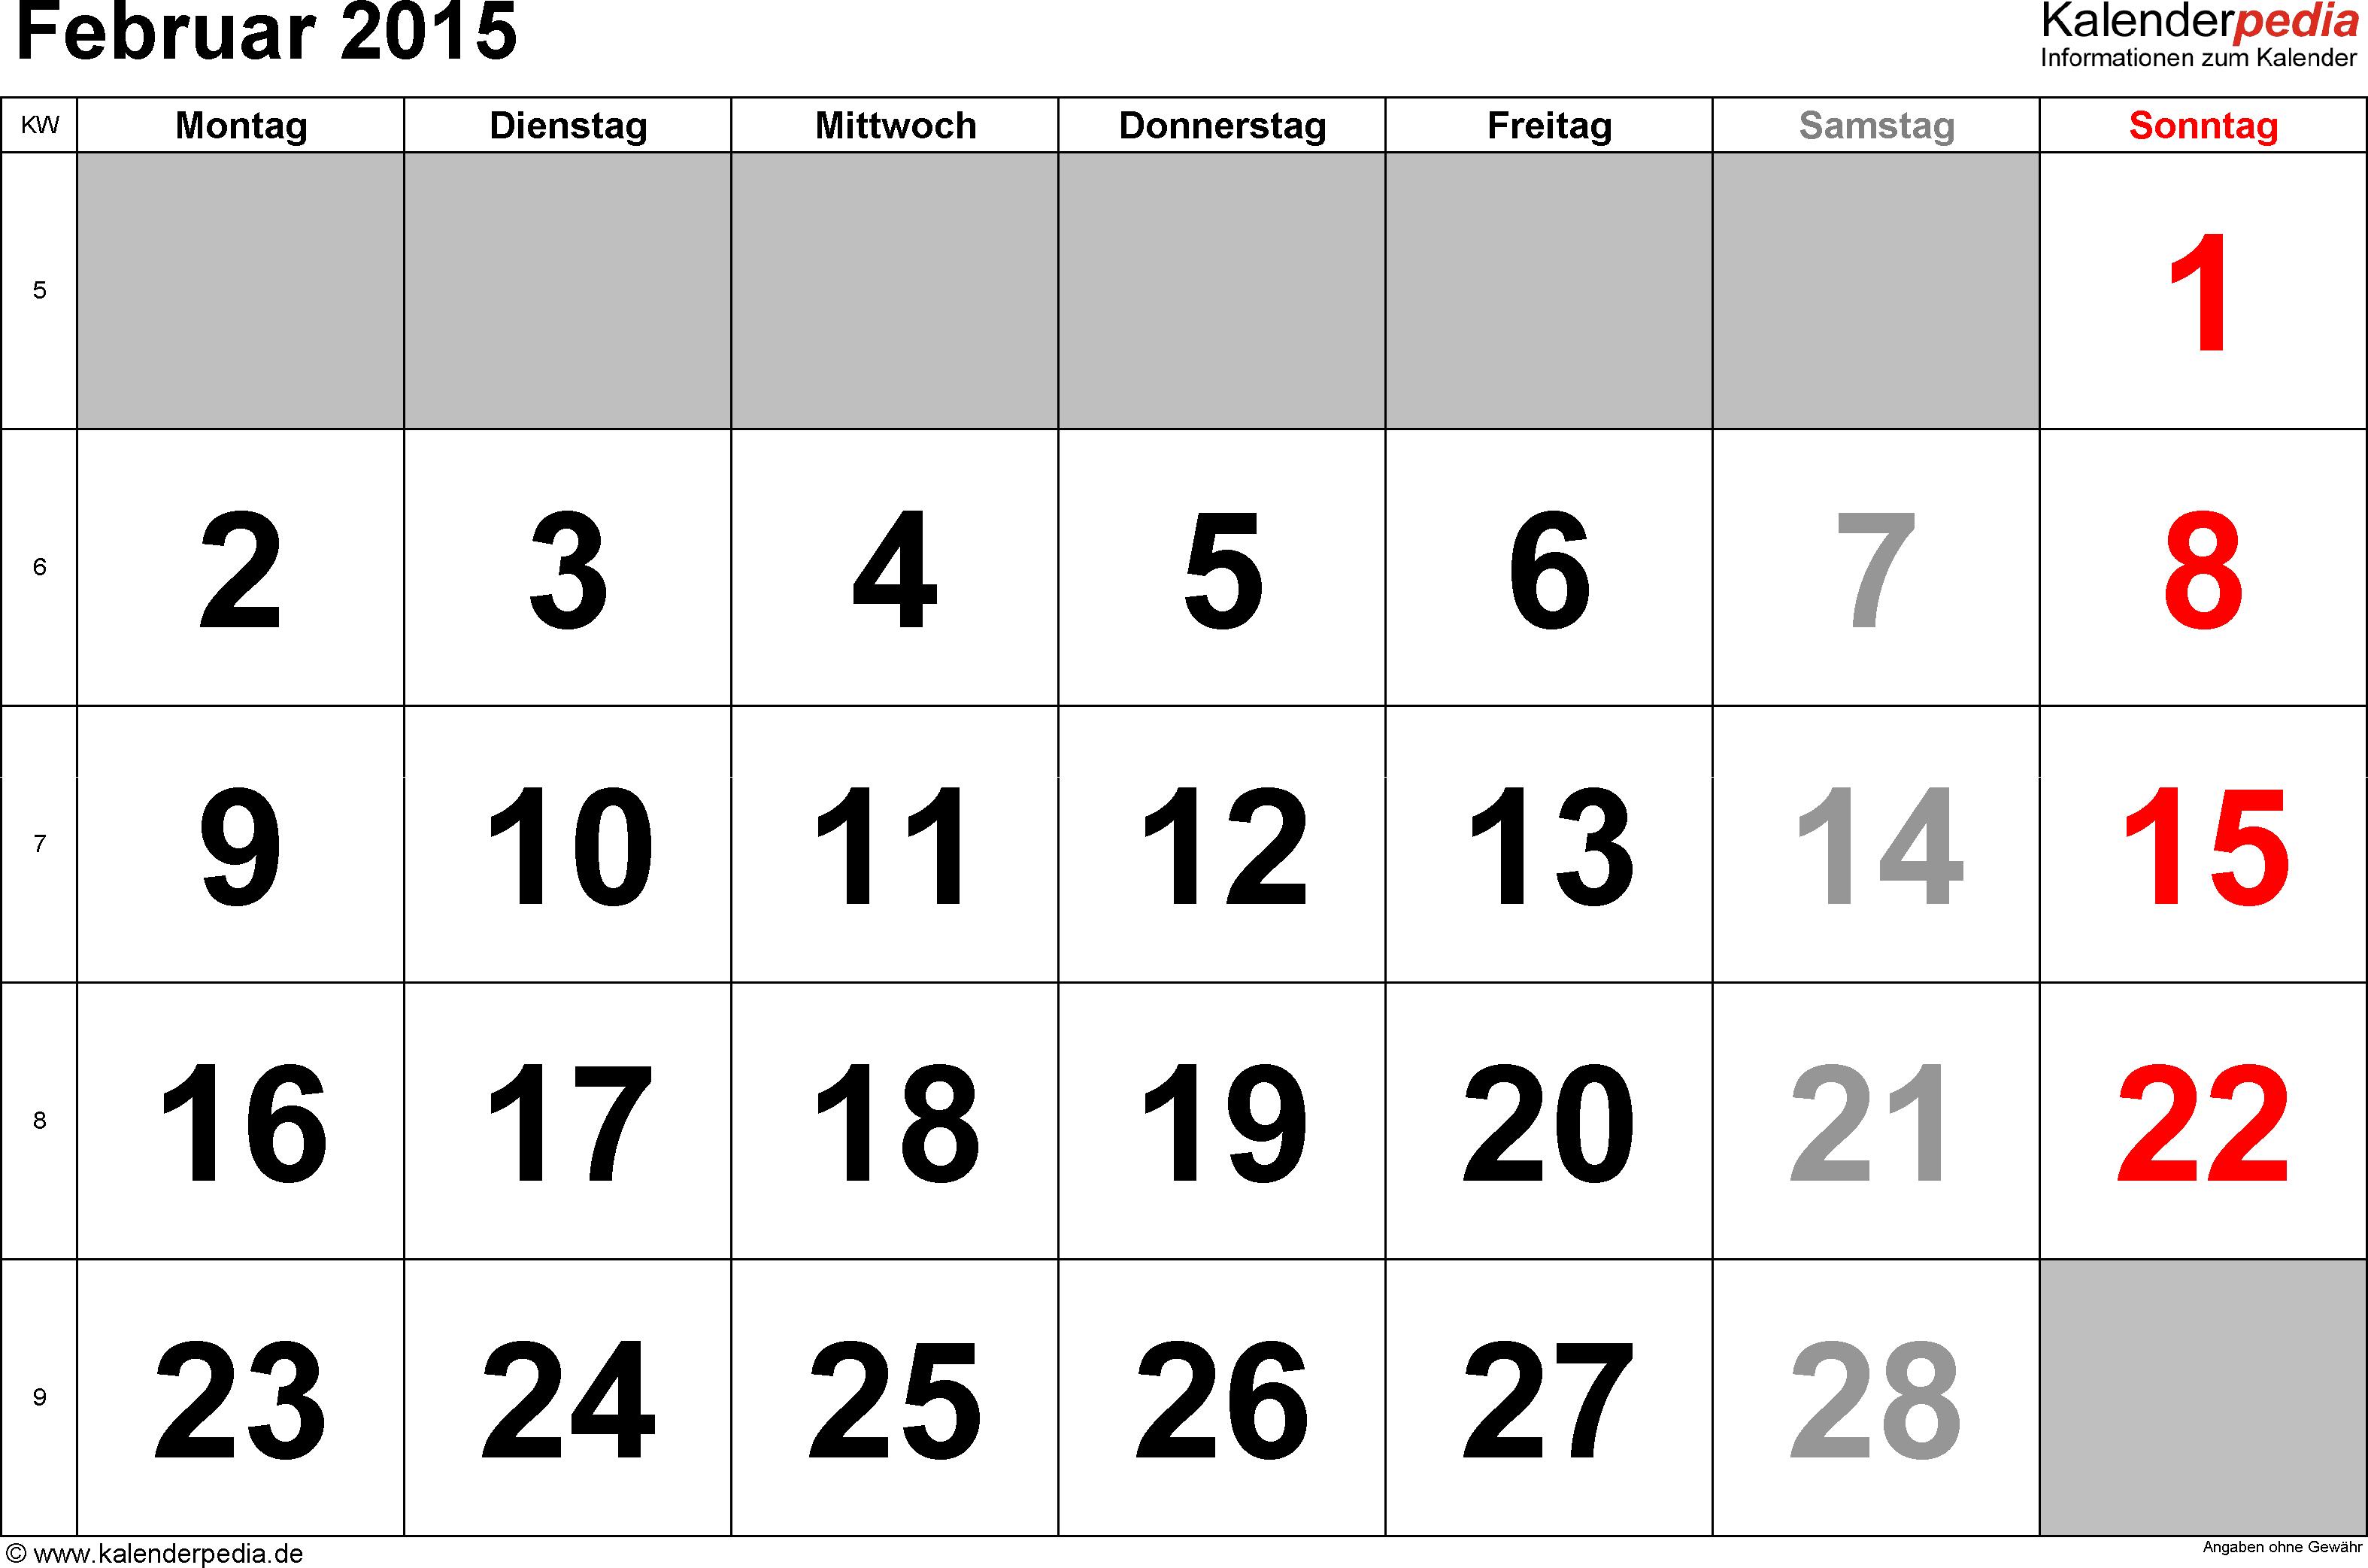 Kalender Februar 2015 im Querformat, grosse Ziffern